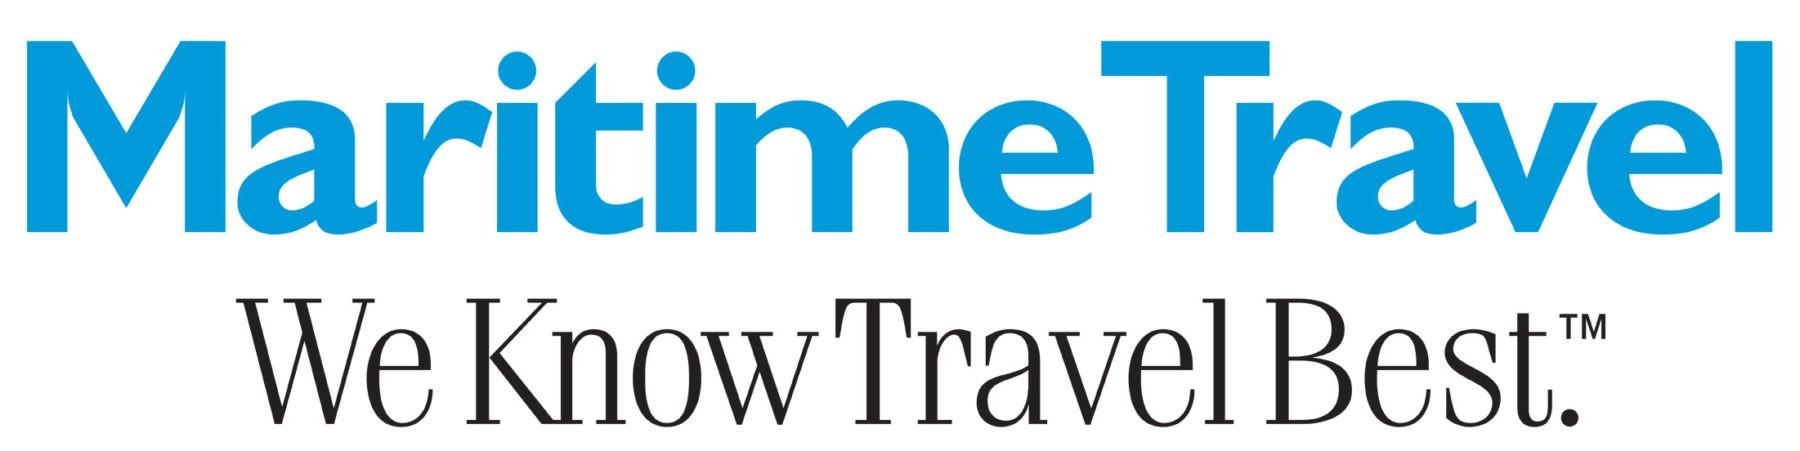 Maritime Travel Manotick logo - Business in Manotick